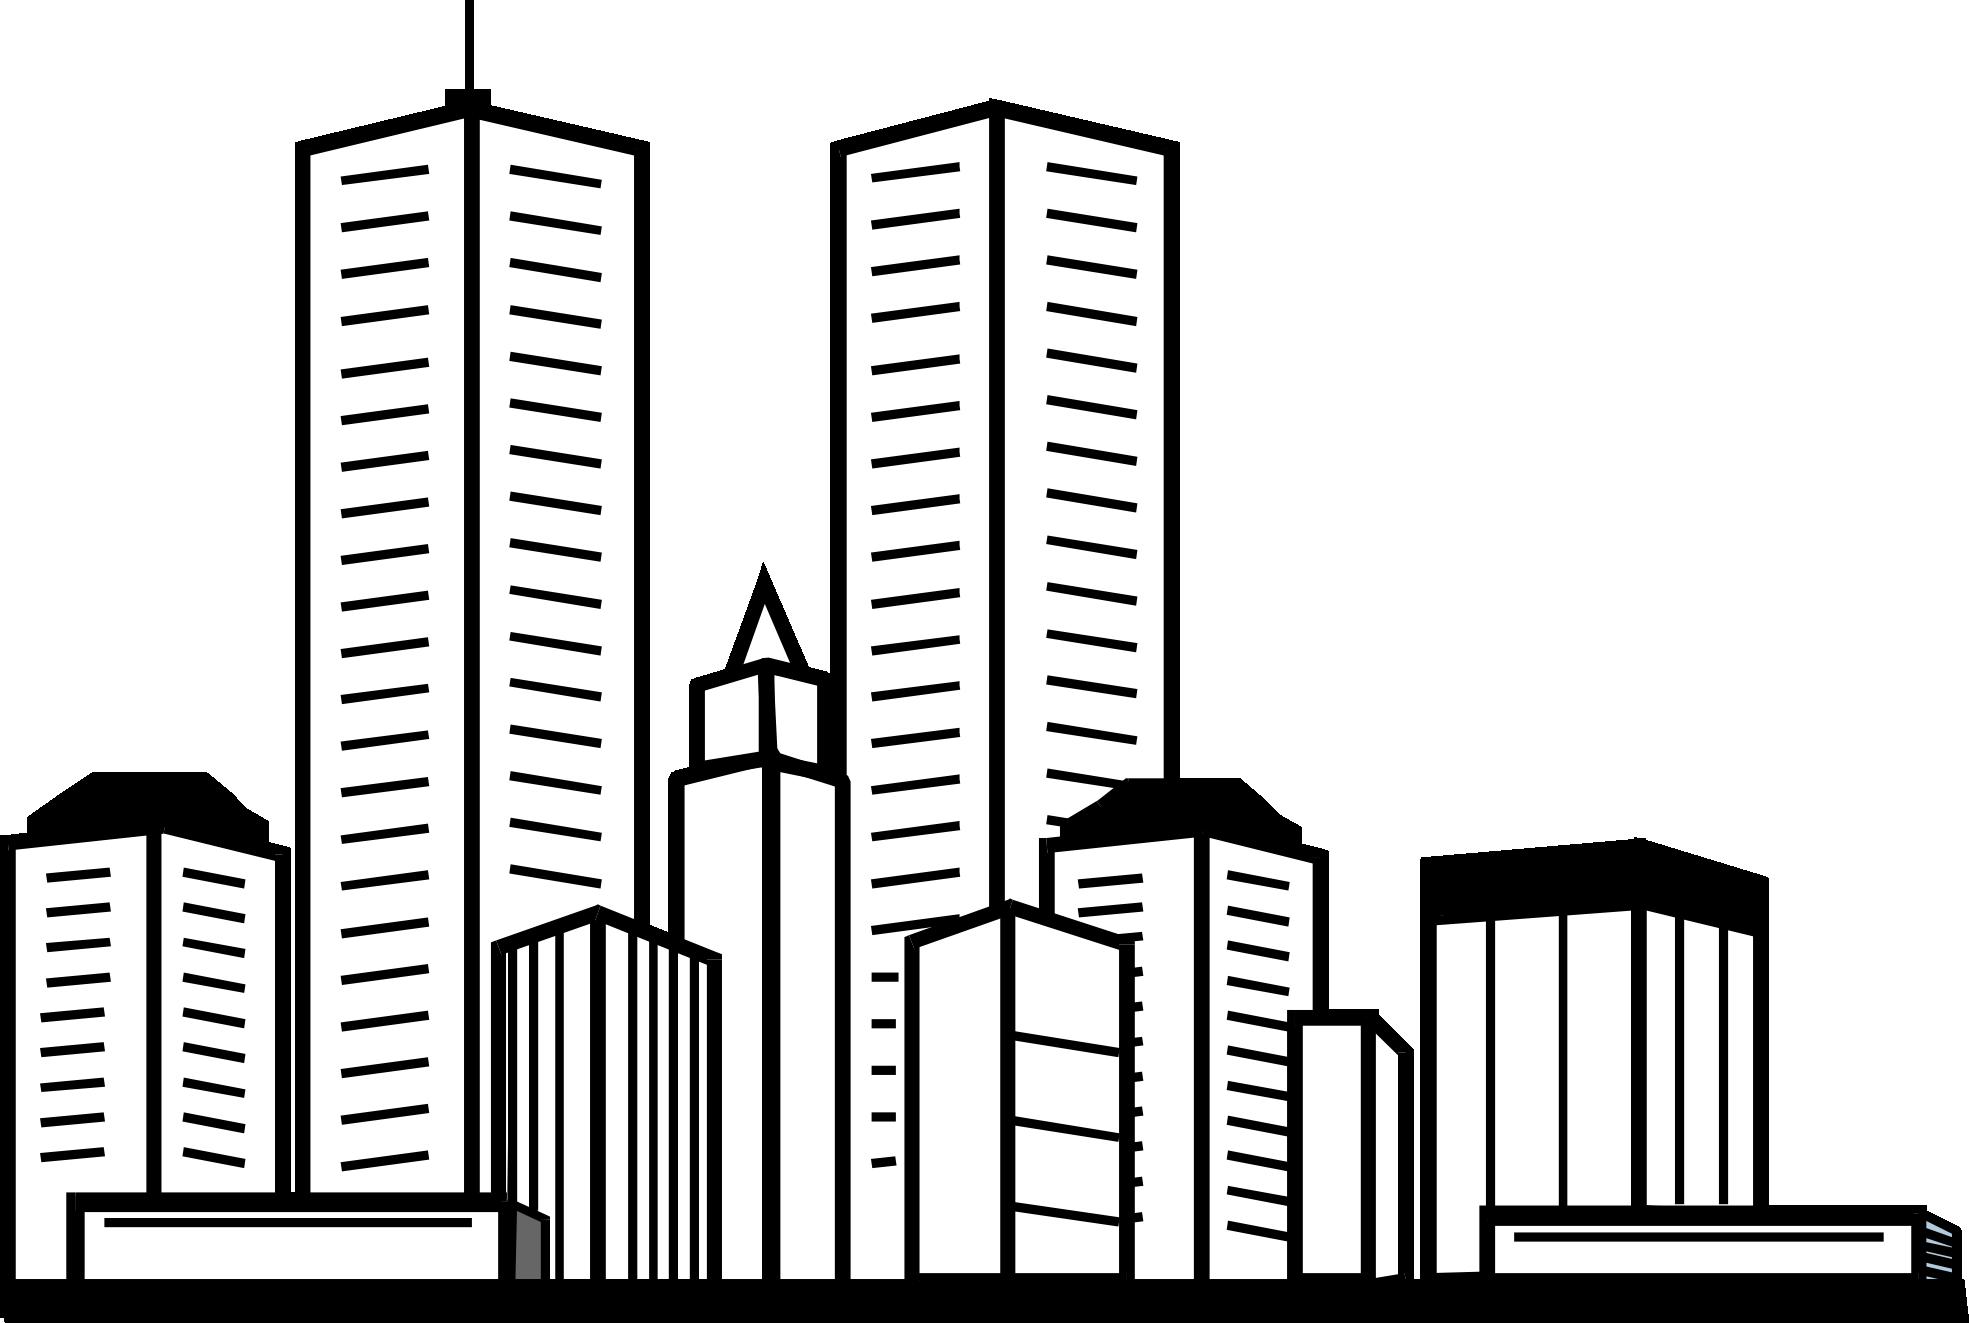 clipart free download dj drawing skyscraper #93405621